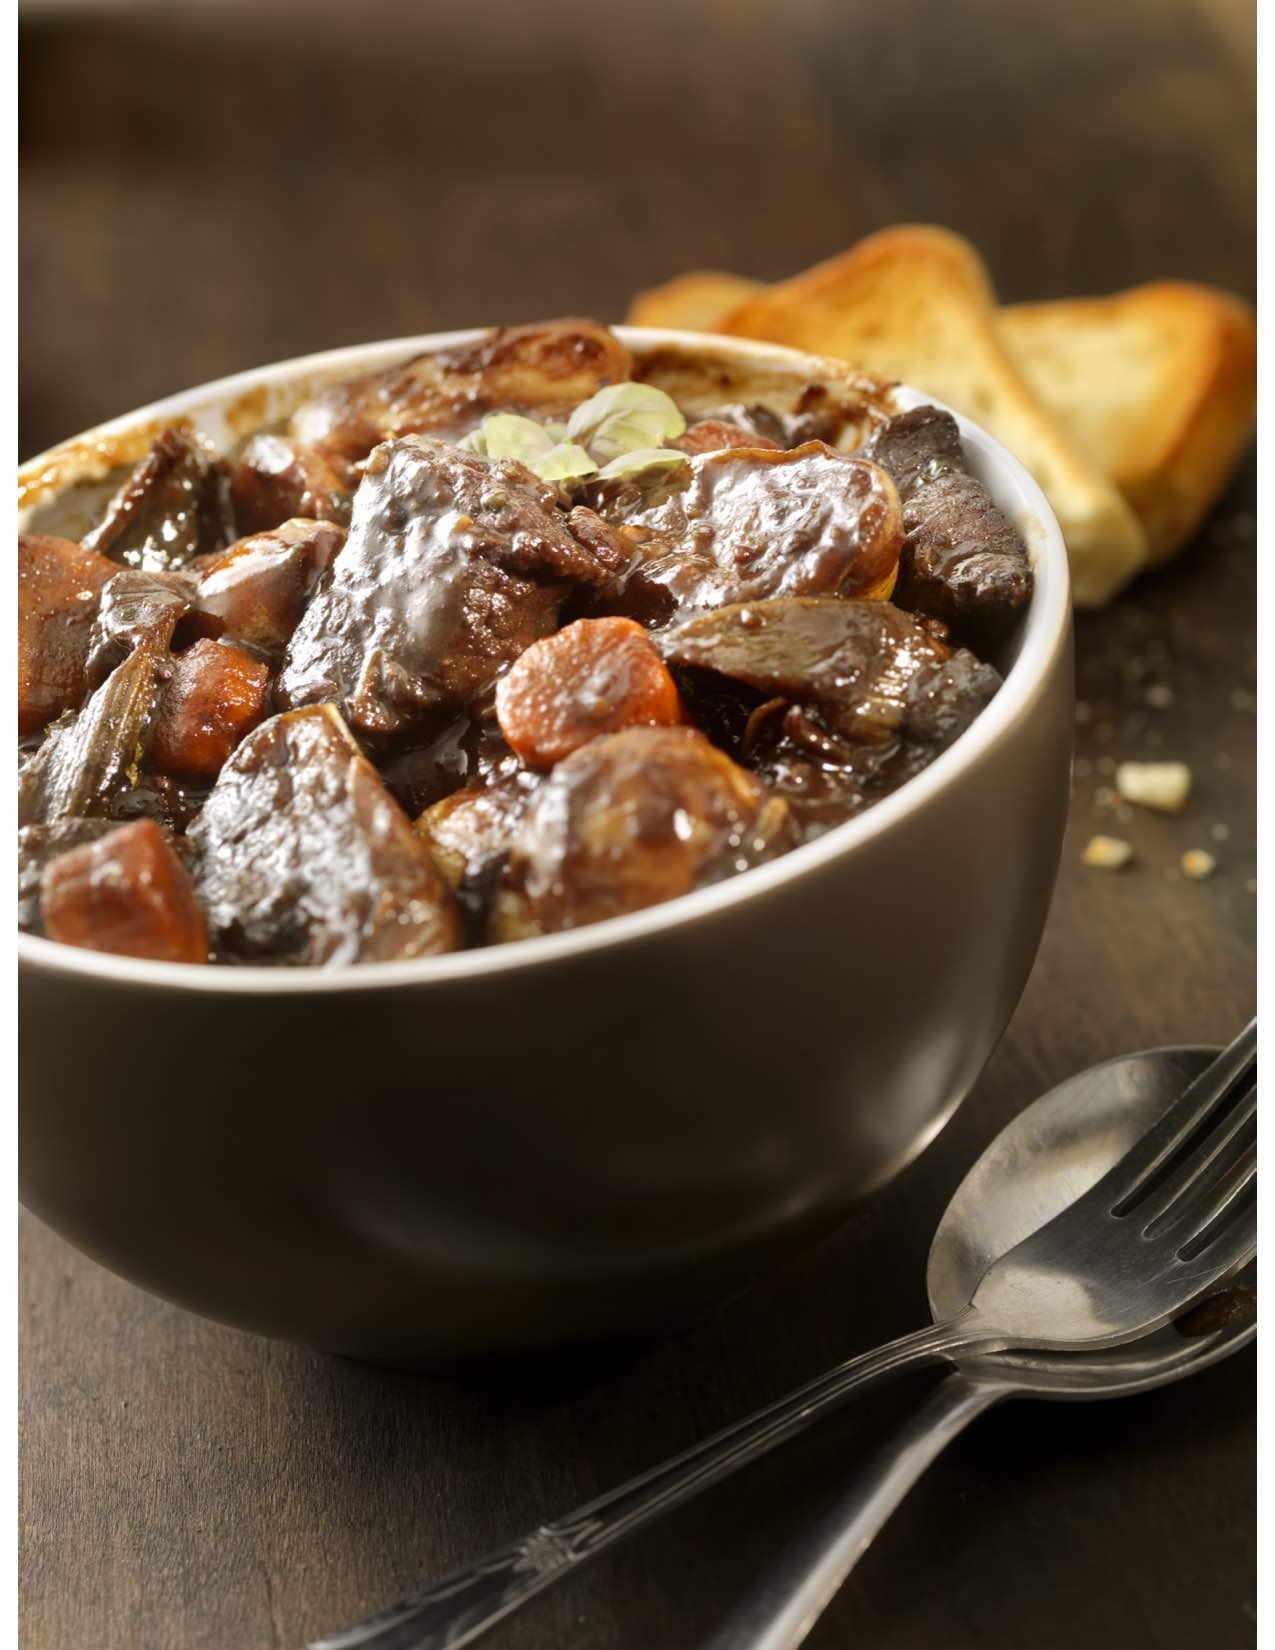 Marcia's Savory Beef Stew